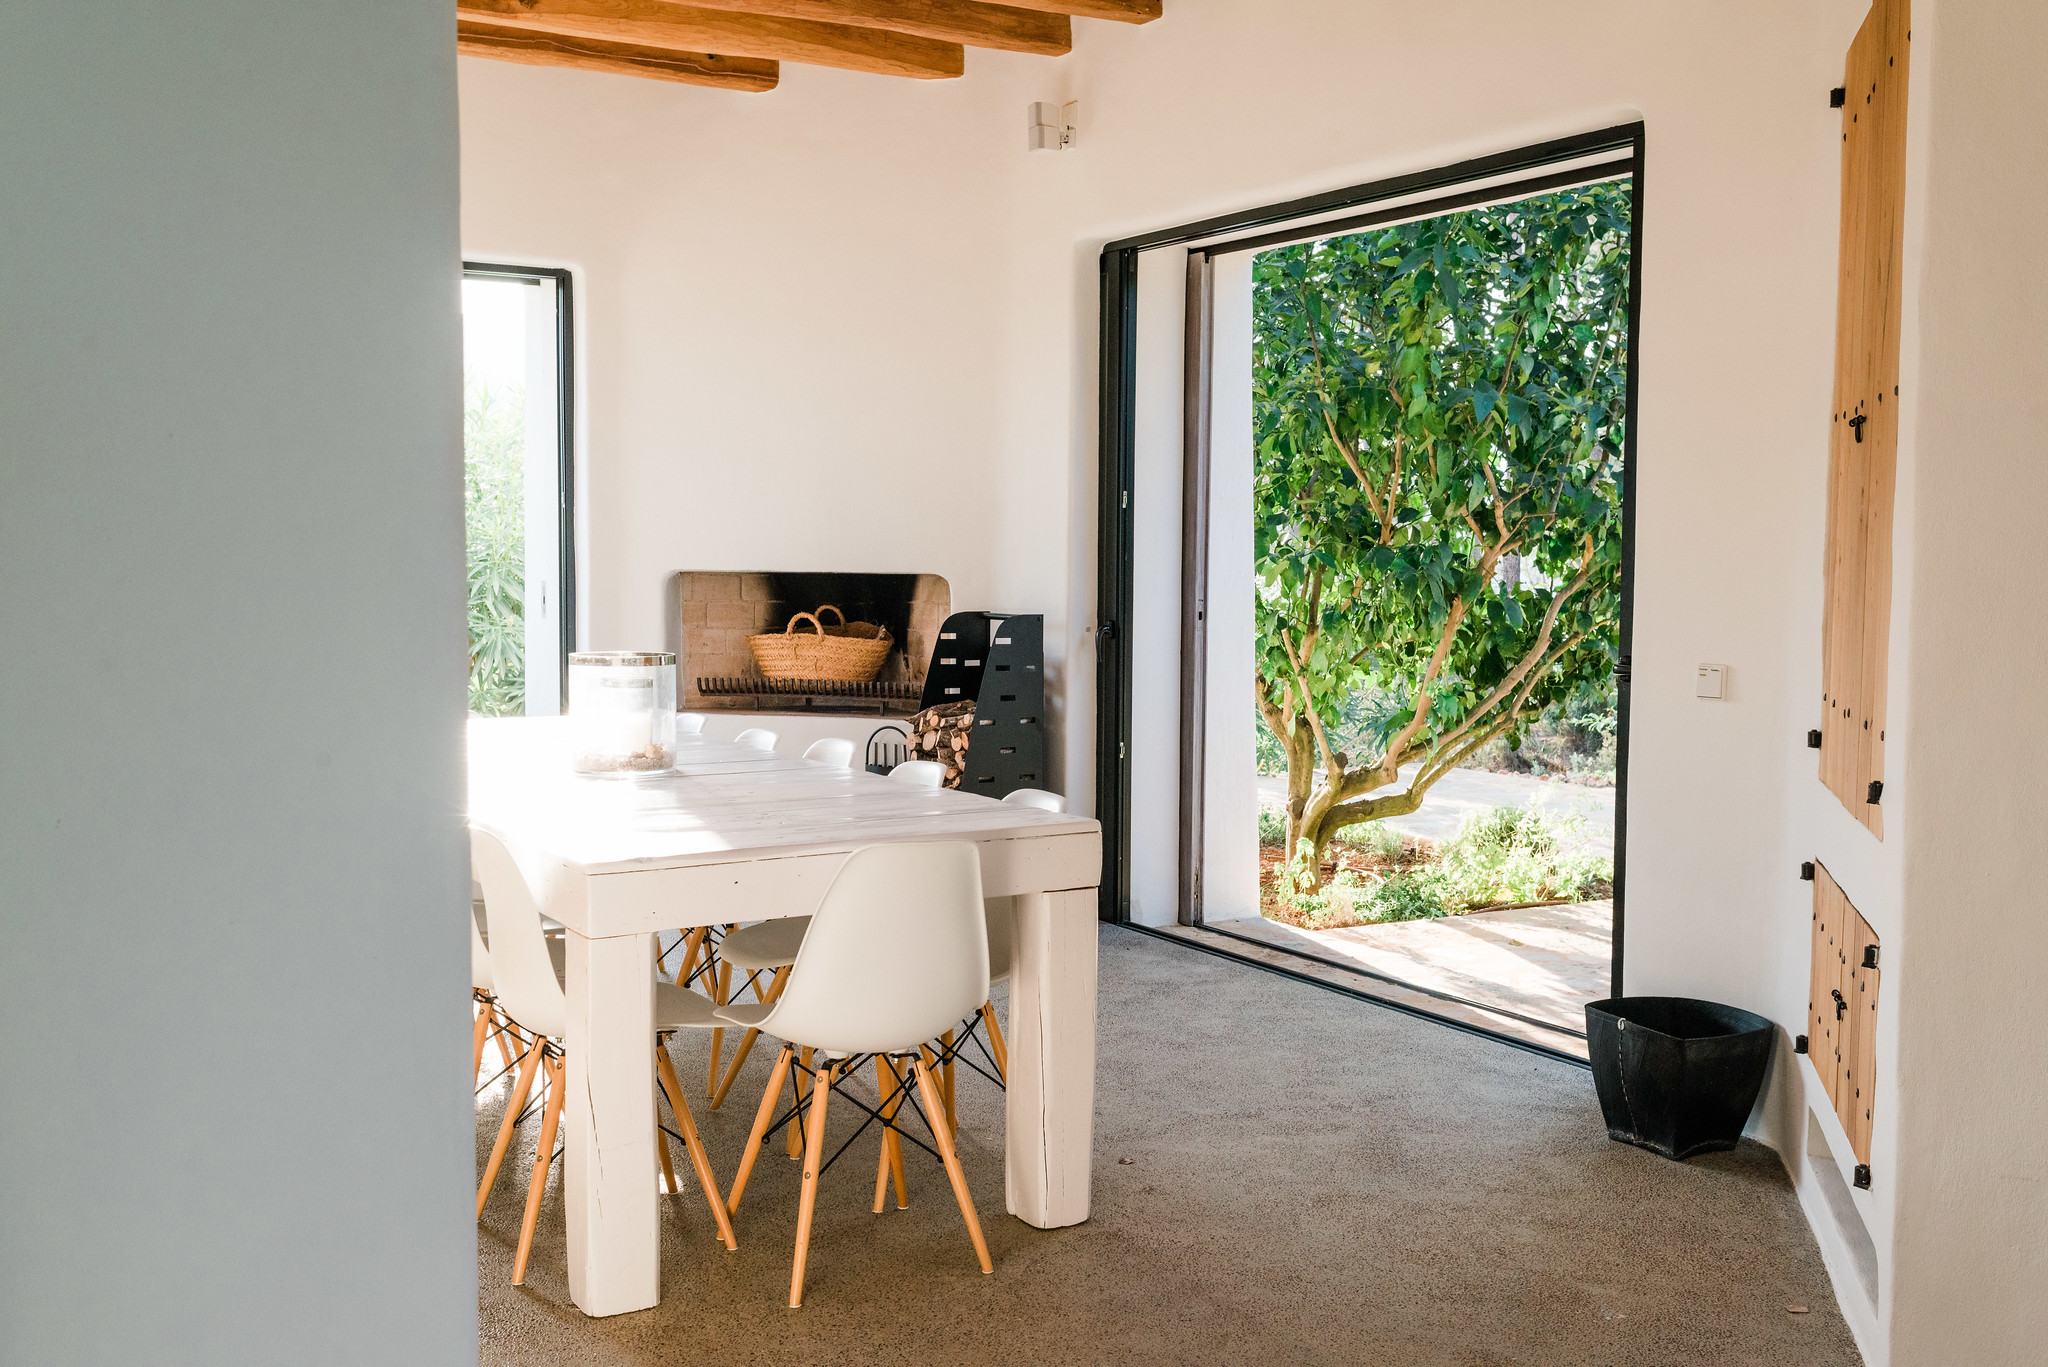 https://www.white-ibiza.com/wp-content/uploads/2020/05/white-ibiza-villas-can-terra-glimpse-into-kitchen.jpg